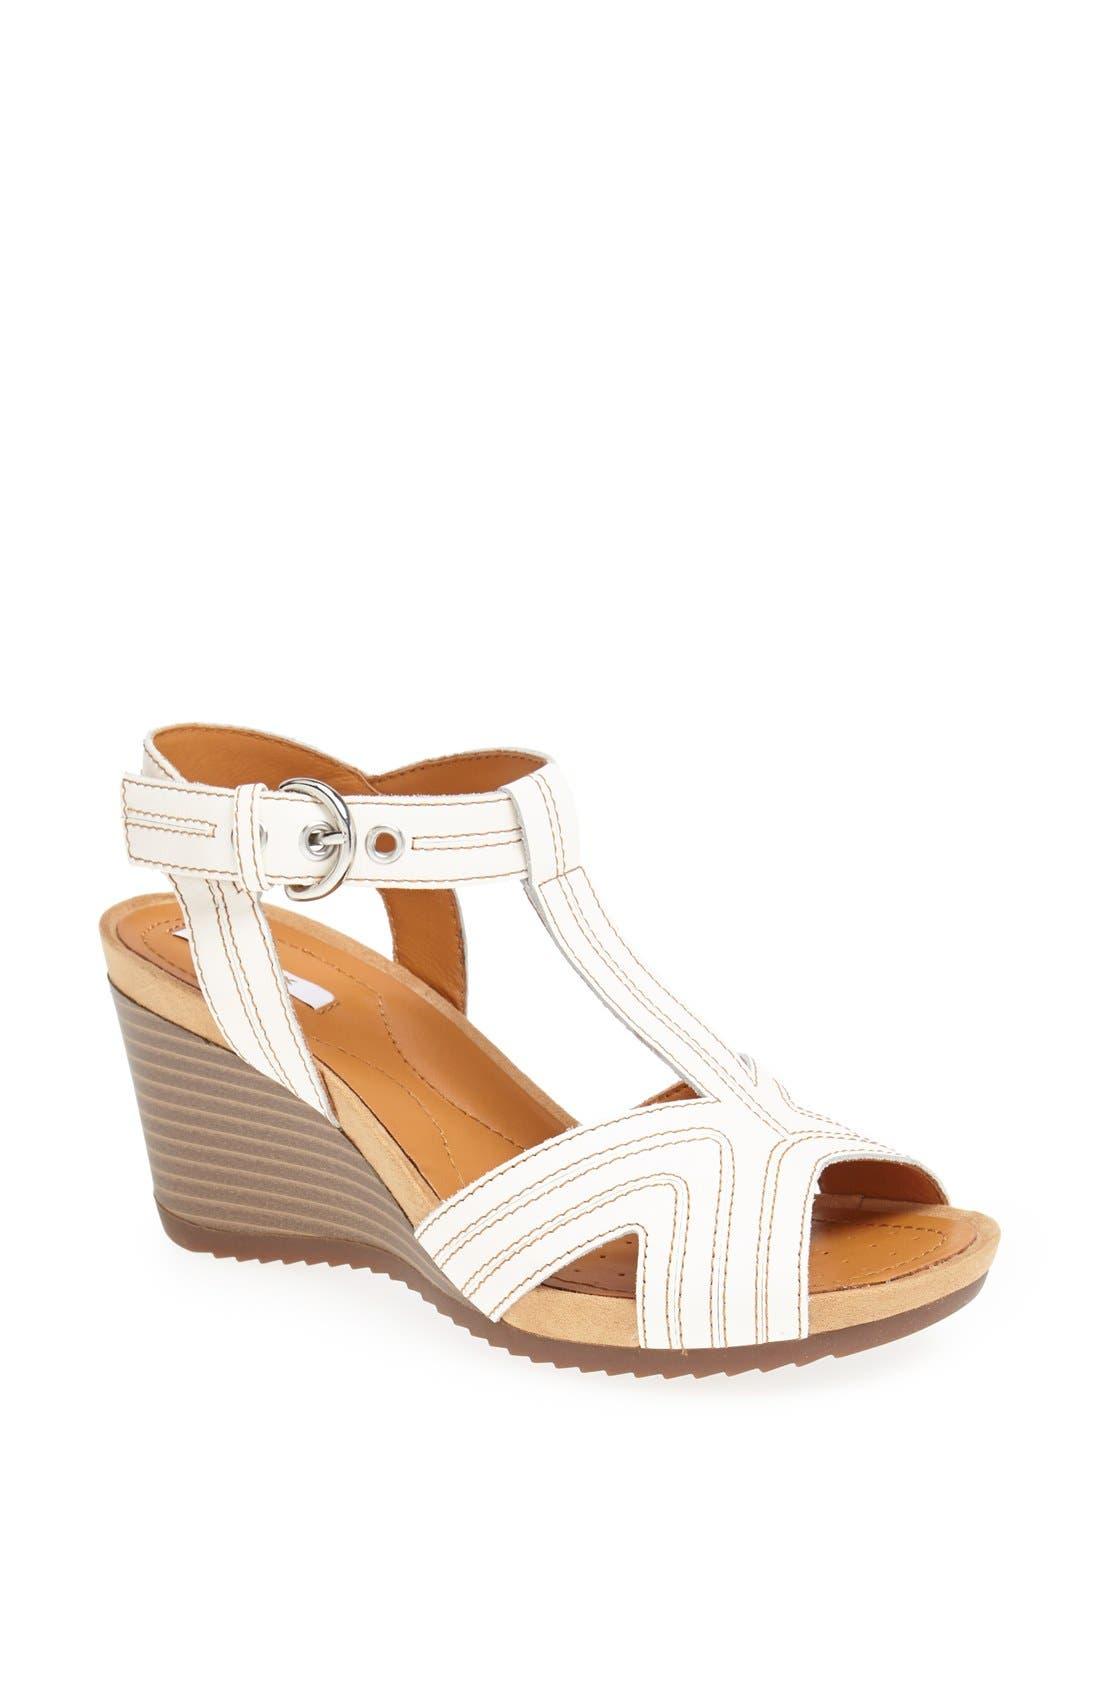 Main Image - Geox 'Roxy' Mid Wedge Sandal (Women)